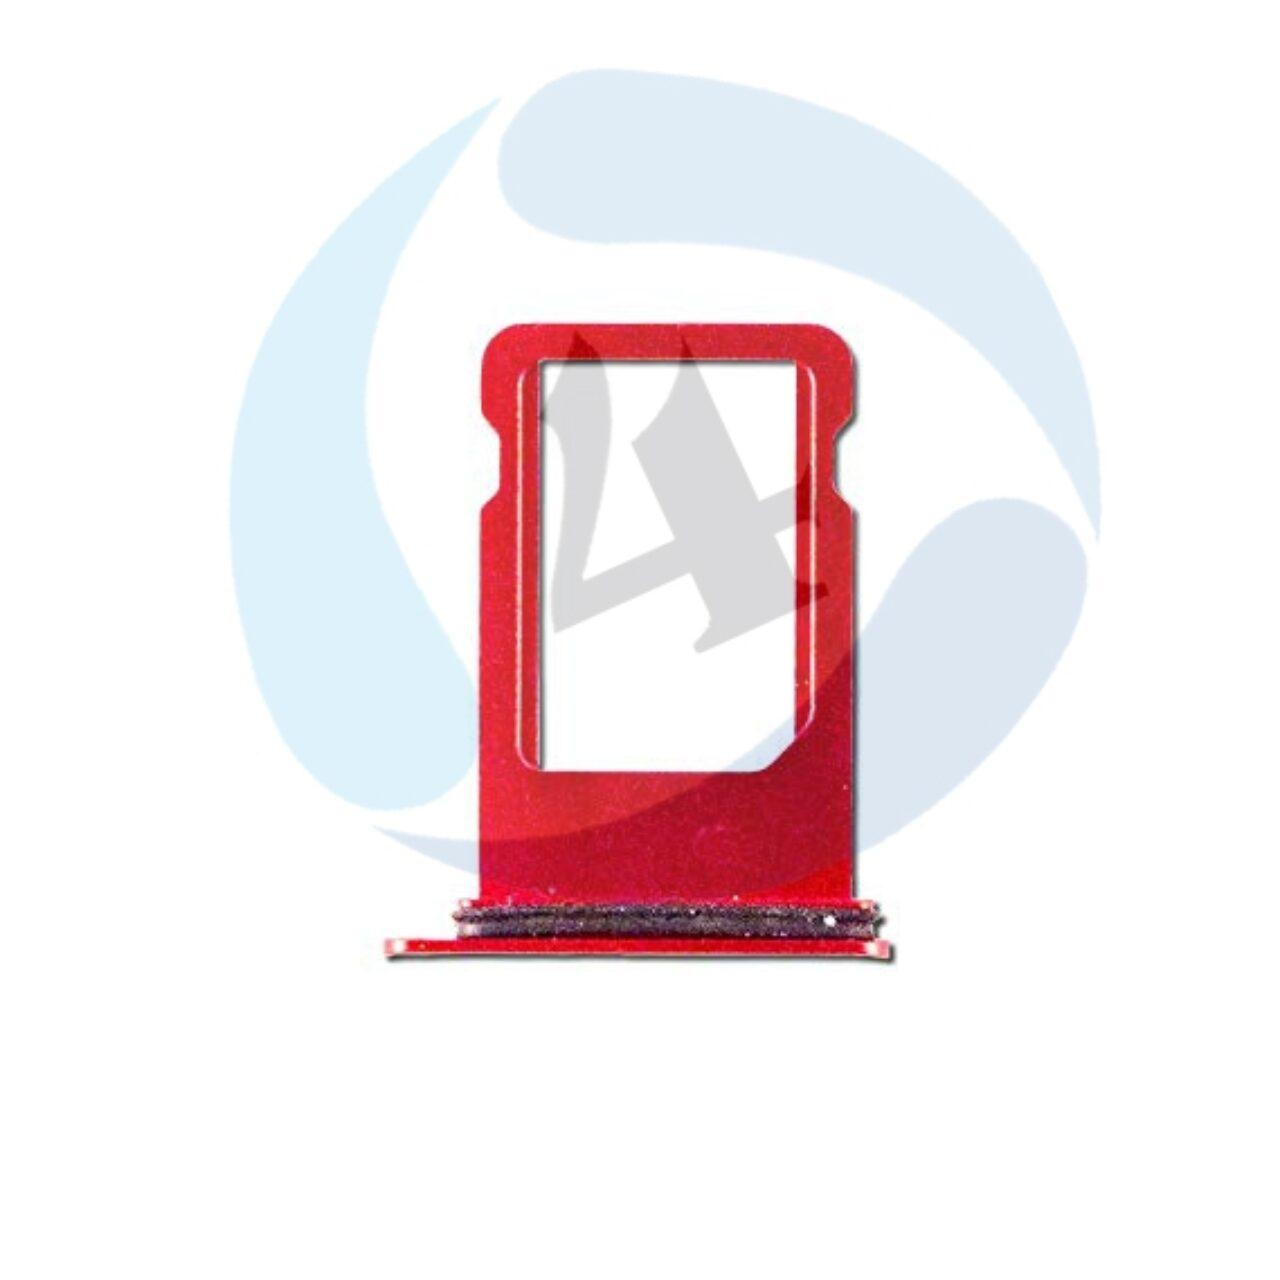 LCD Touch White For Xiaomi Redmi Note 5 Pro MEI7 S MEI7 lcd scherm display